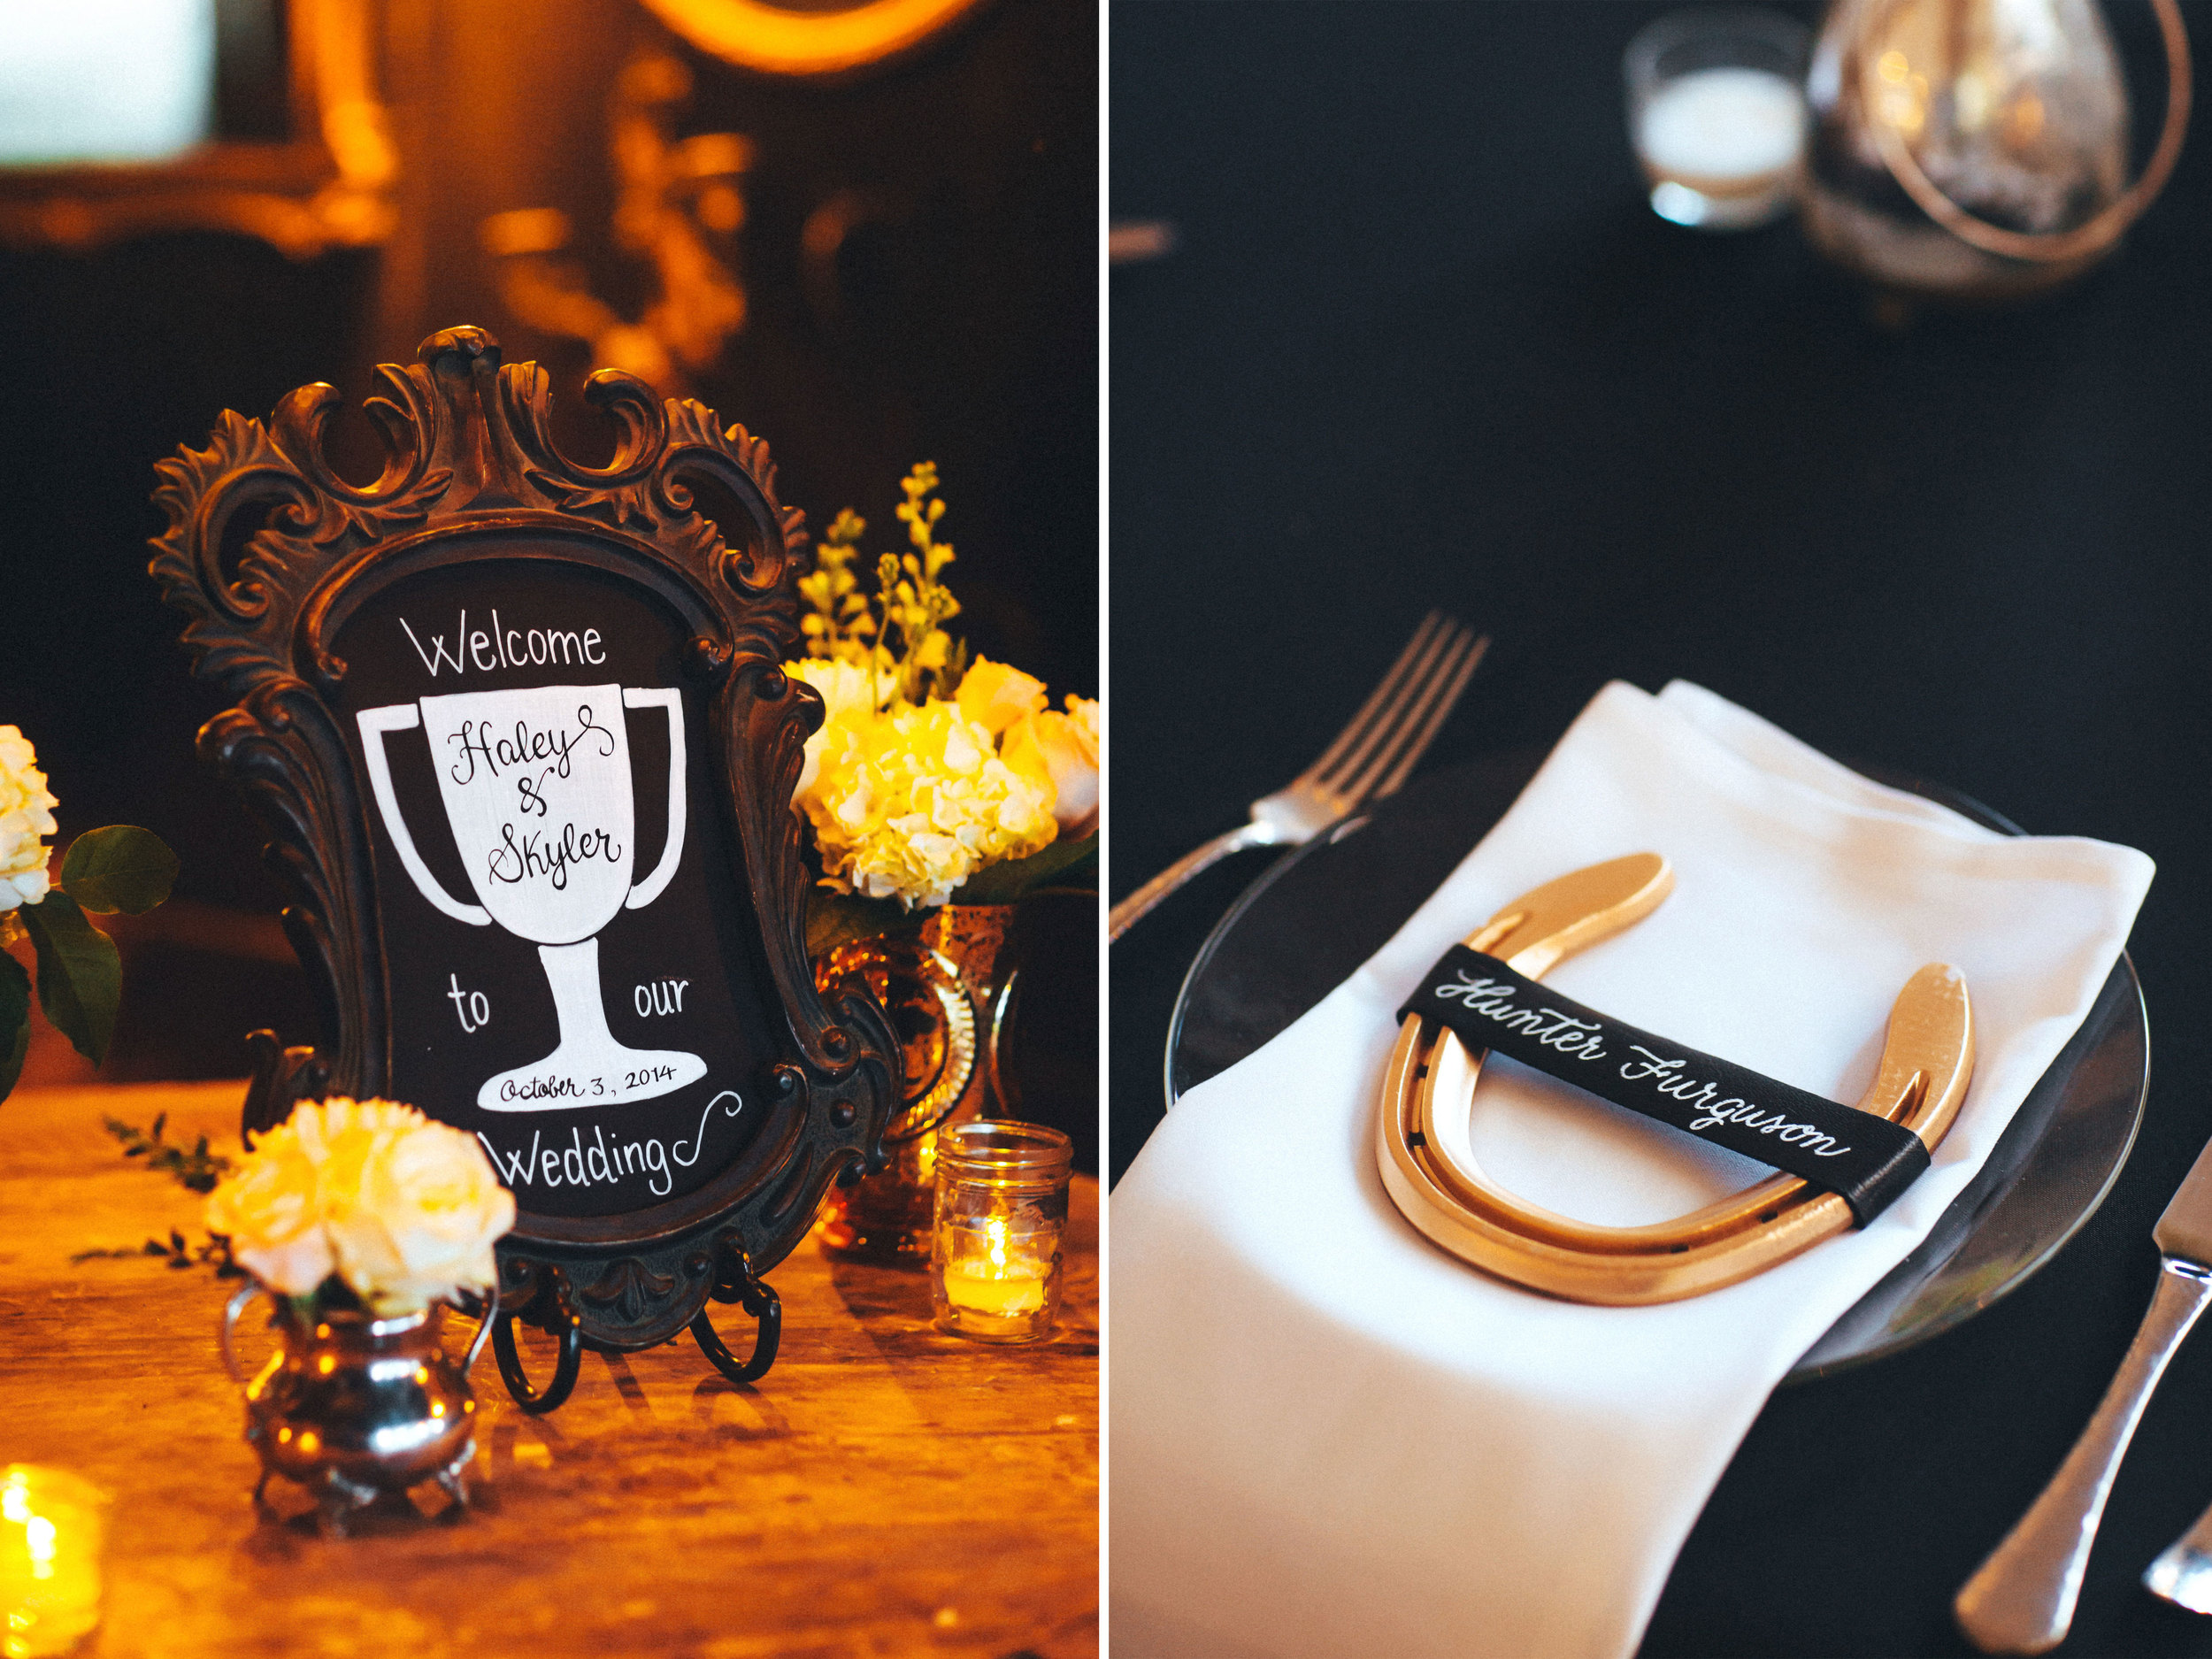 Me & Mr. Jones Wedding, Equestrian Inspired Wedding Decor, Horseshoe Place Cards, Gold Horseshoes, Gold Wedding, Rusic Glam Wedding, Black Tablecloths, Barnwood Tables